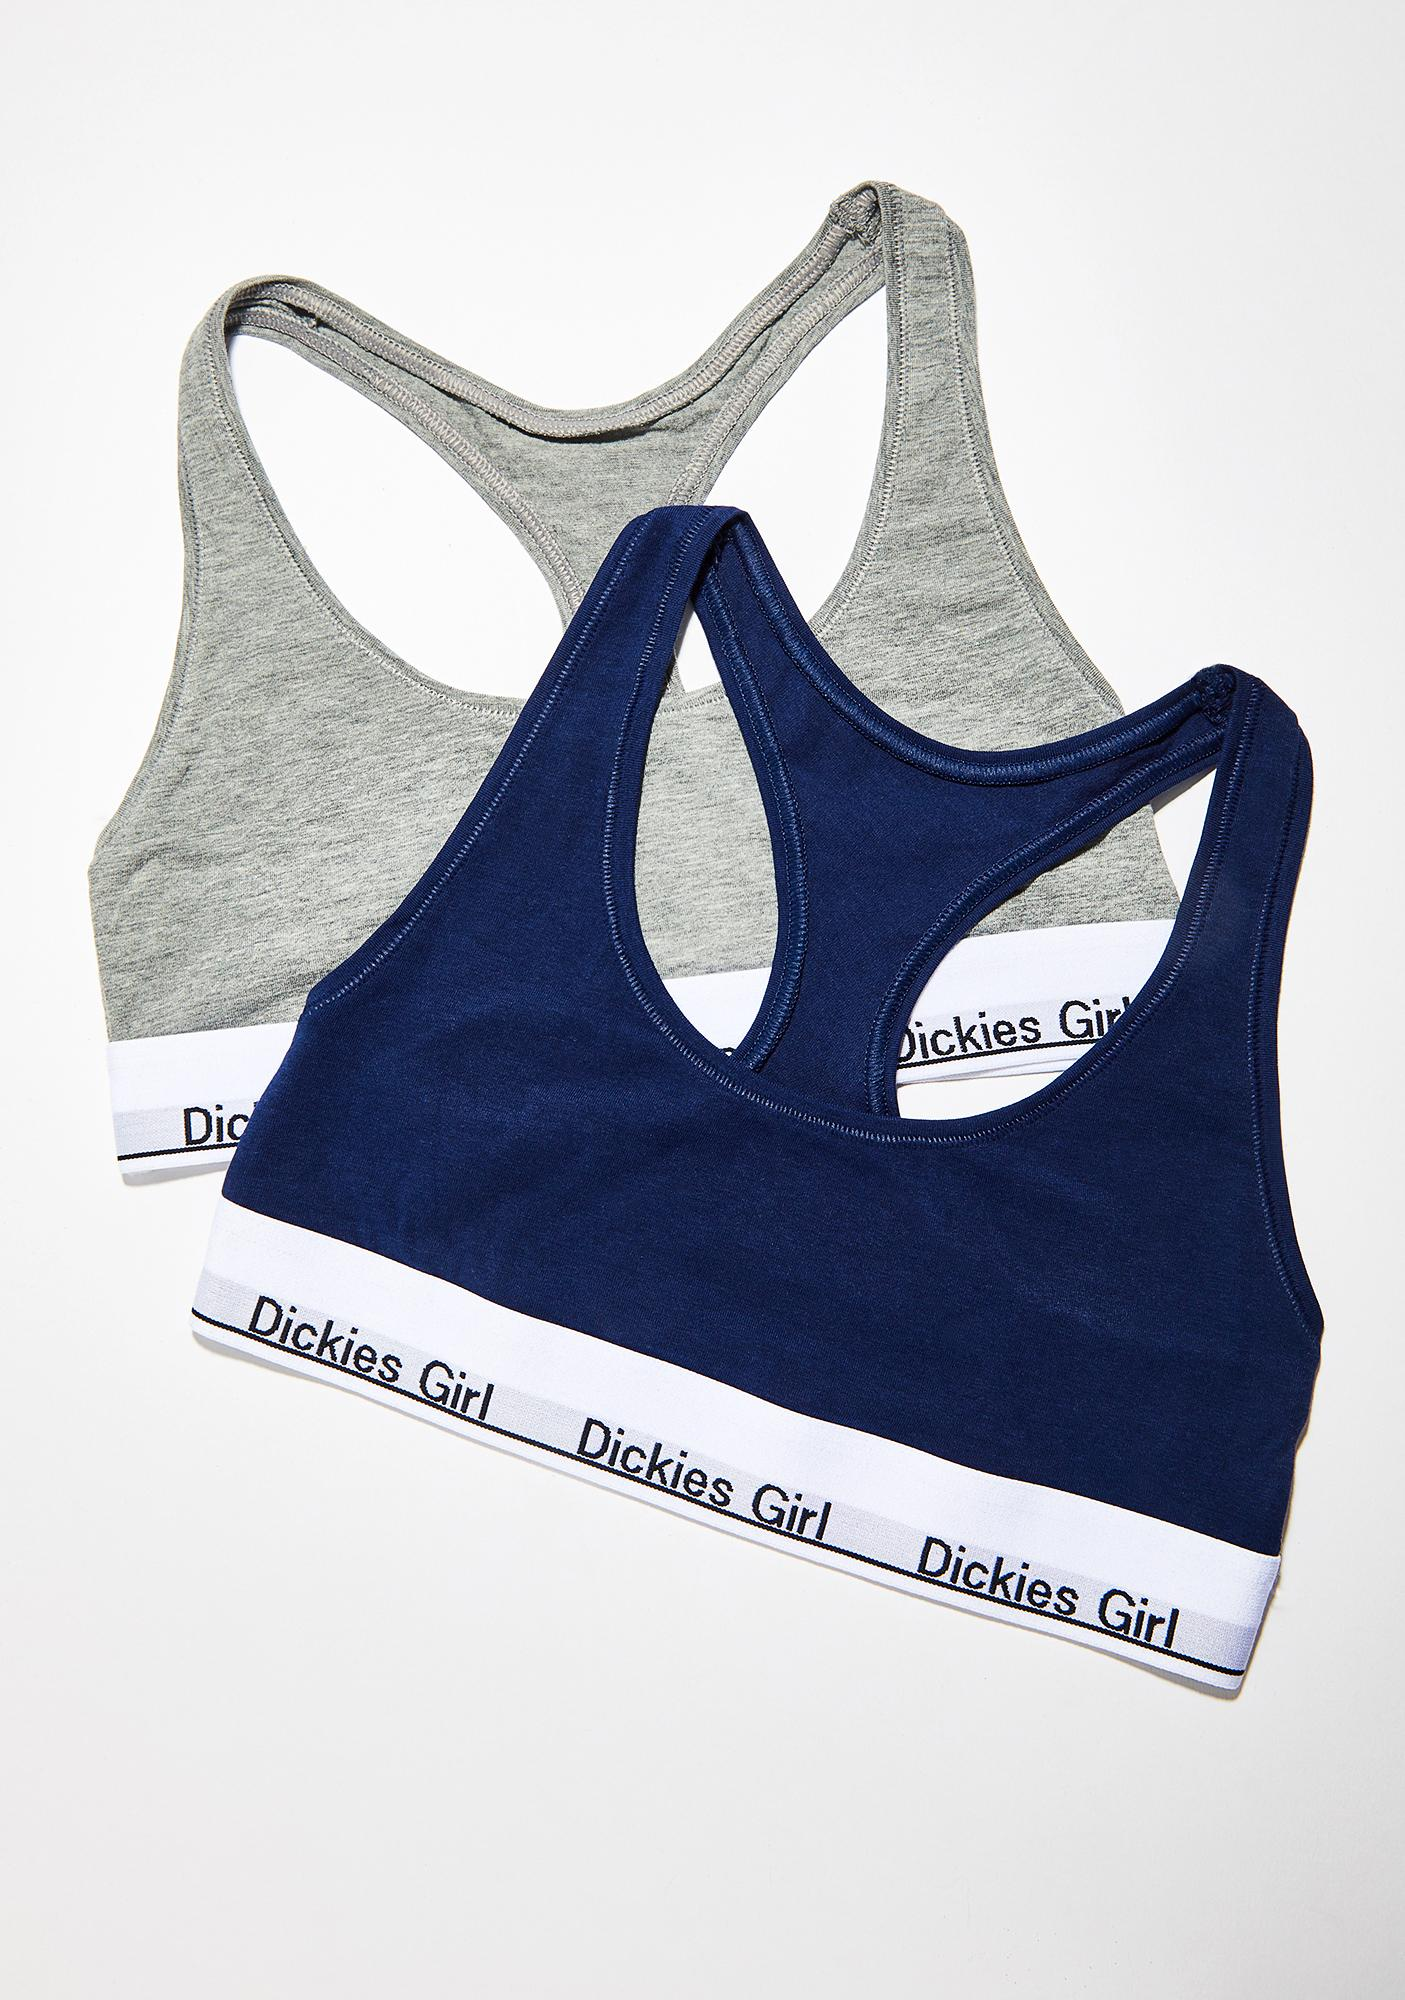 Dickies Girl Stoned Racerback Bralette 2-Pack